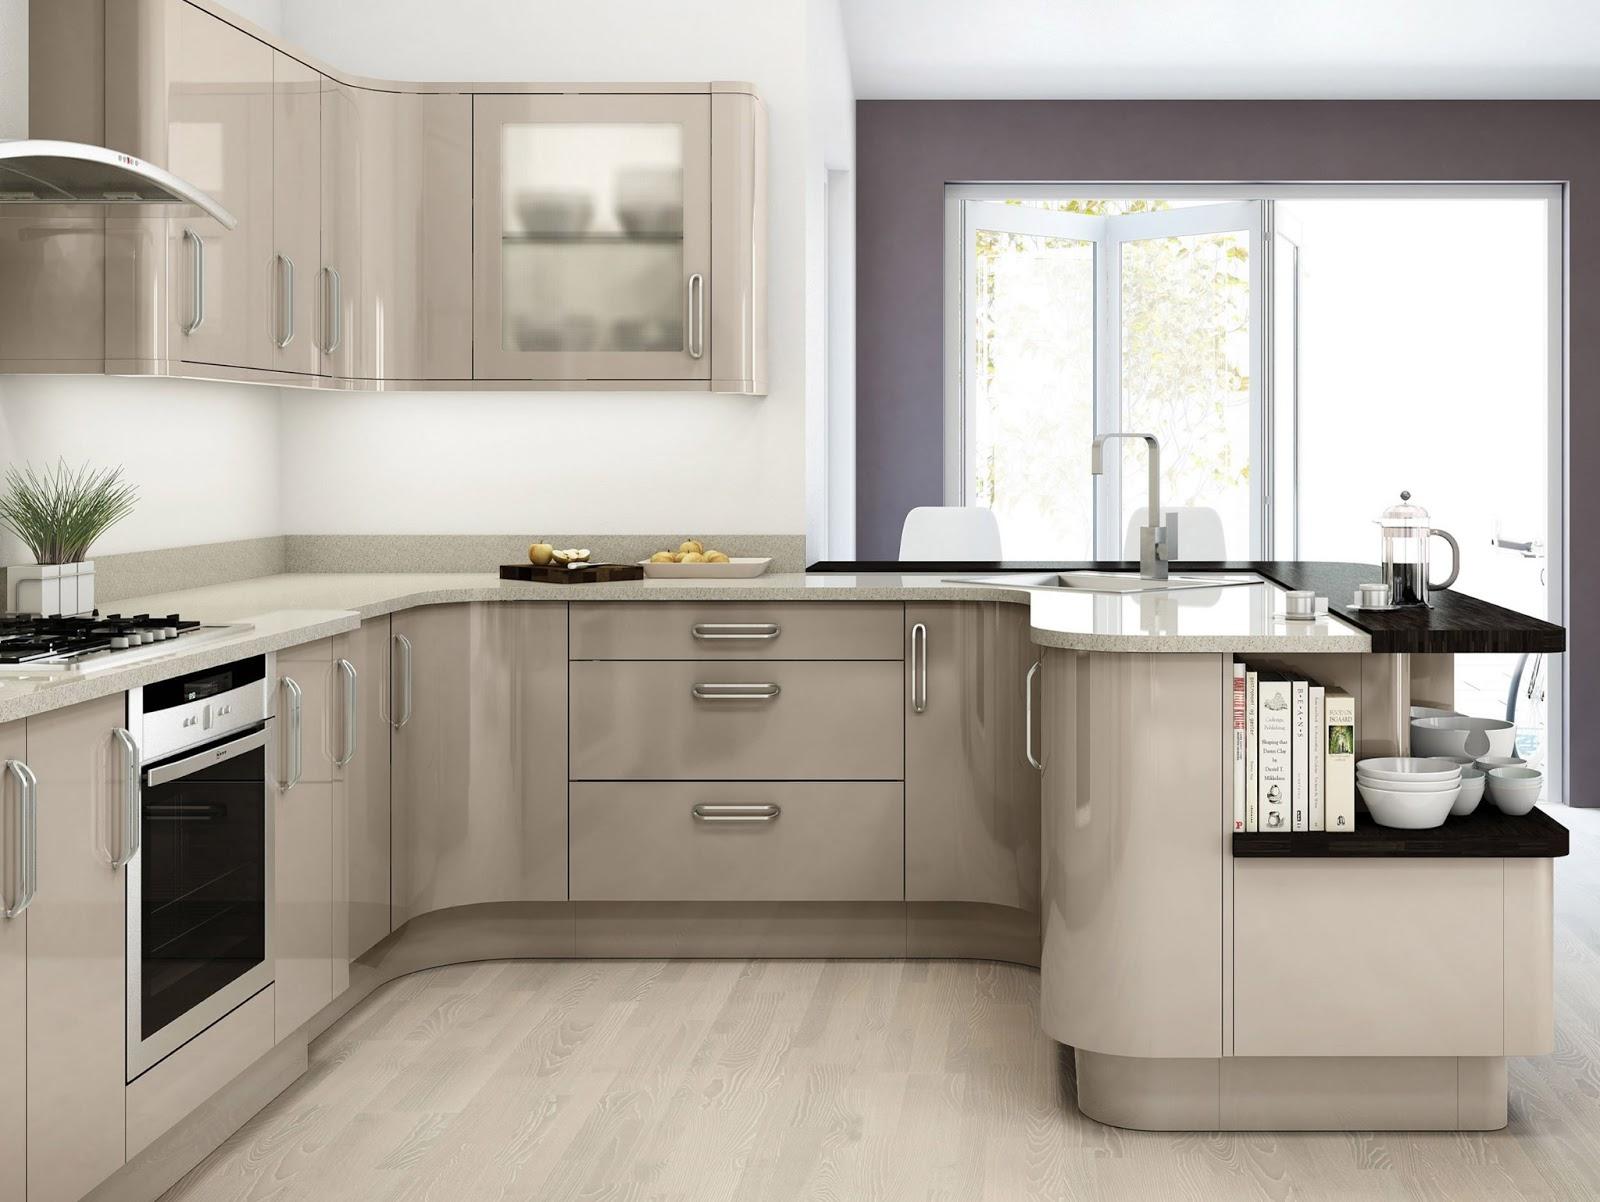 modele cuisine moderne : idees meuble cuisine, plan de travail